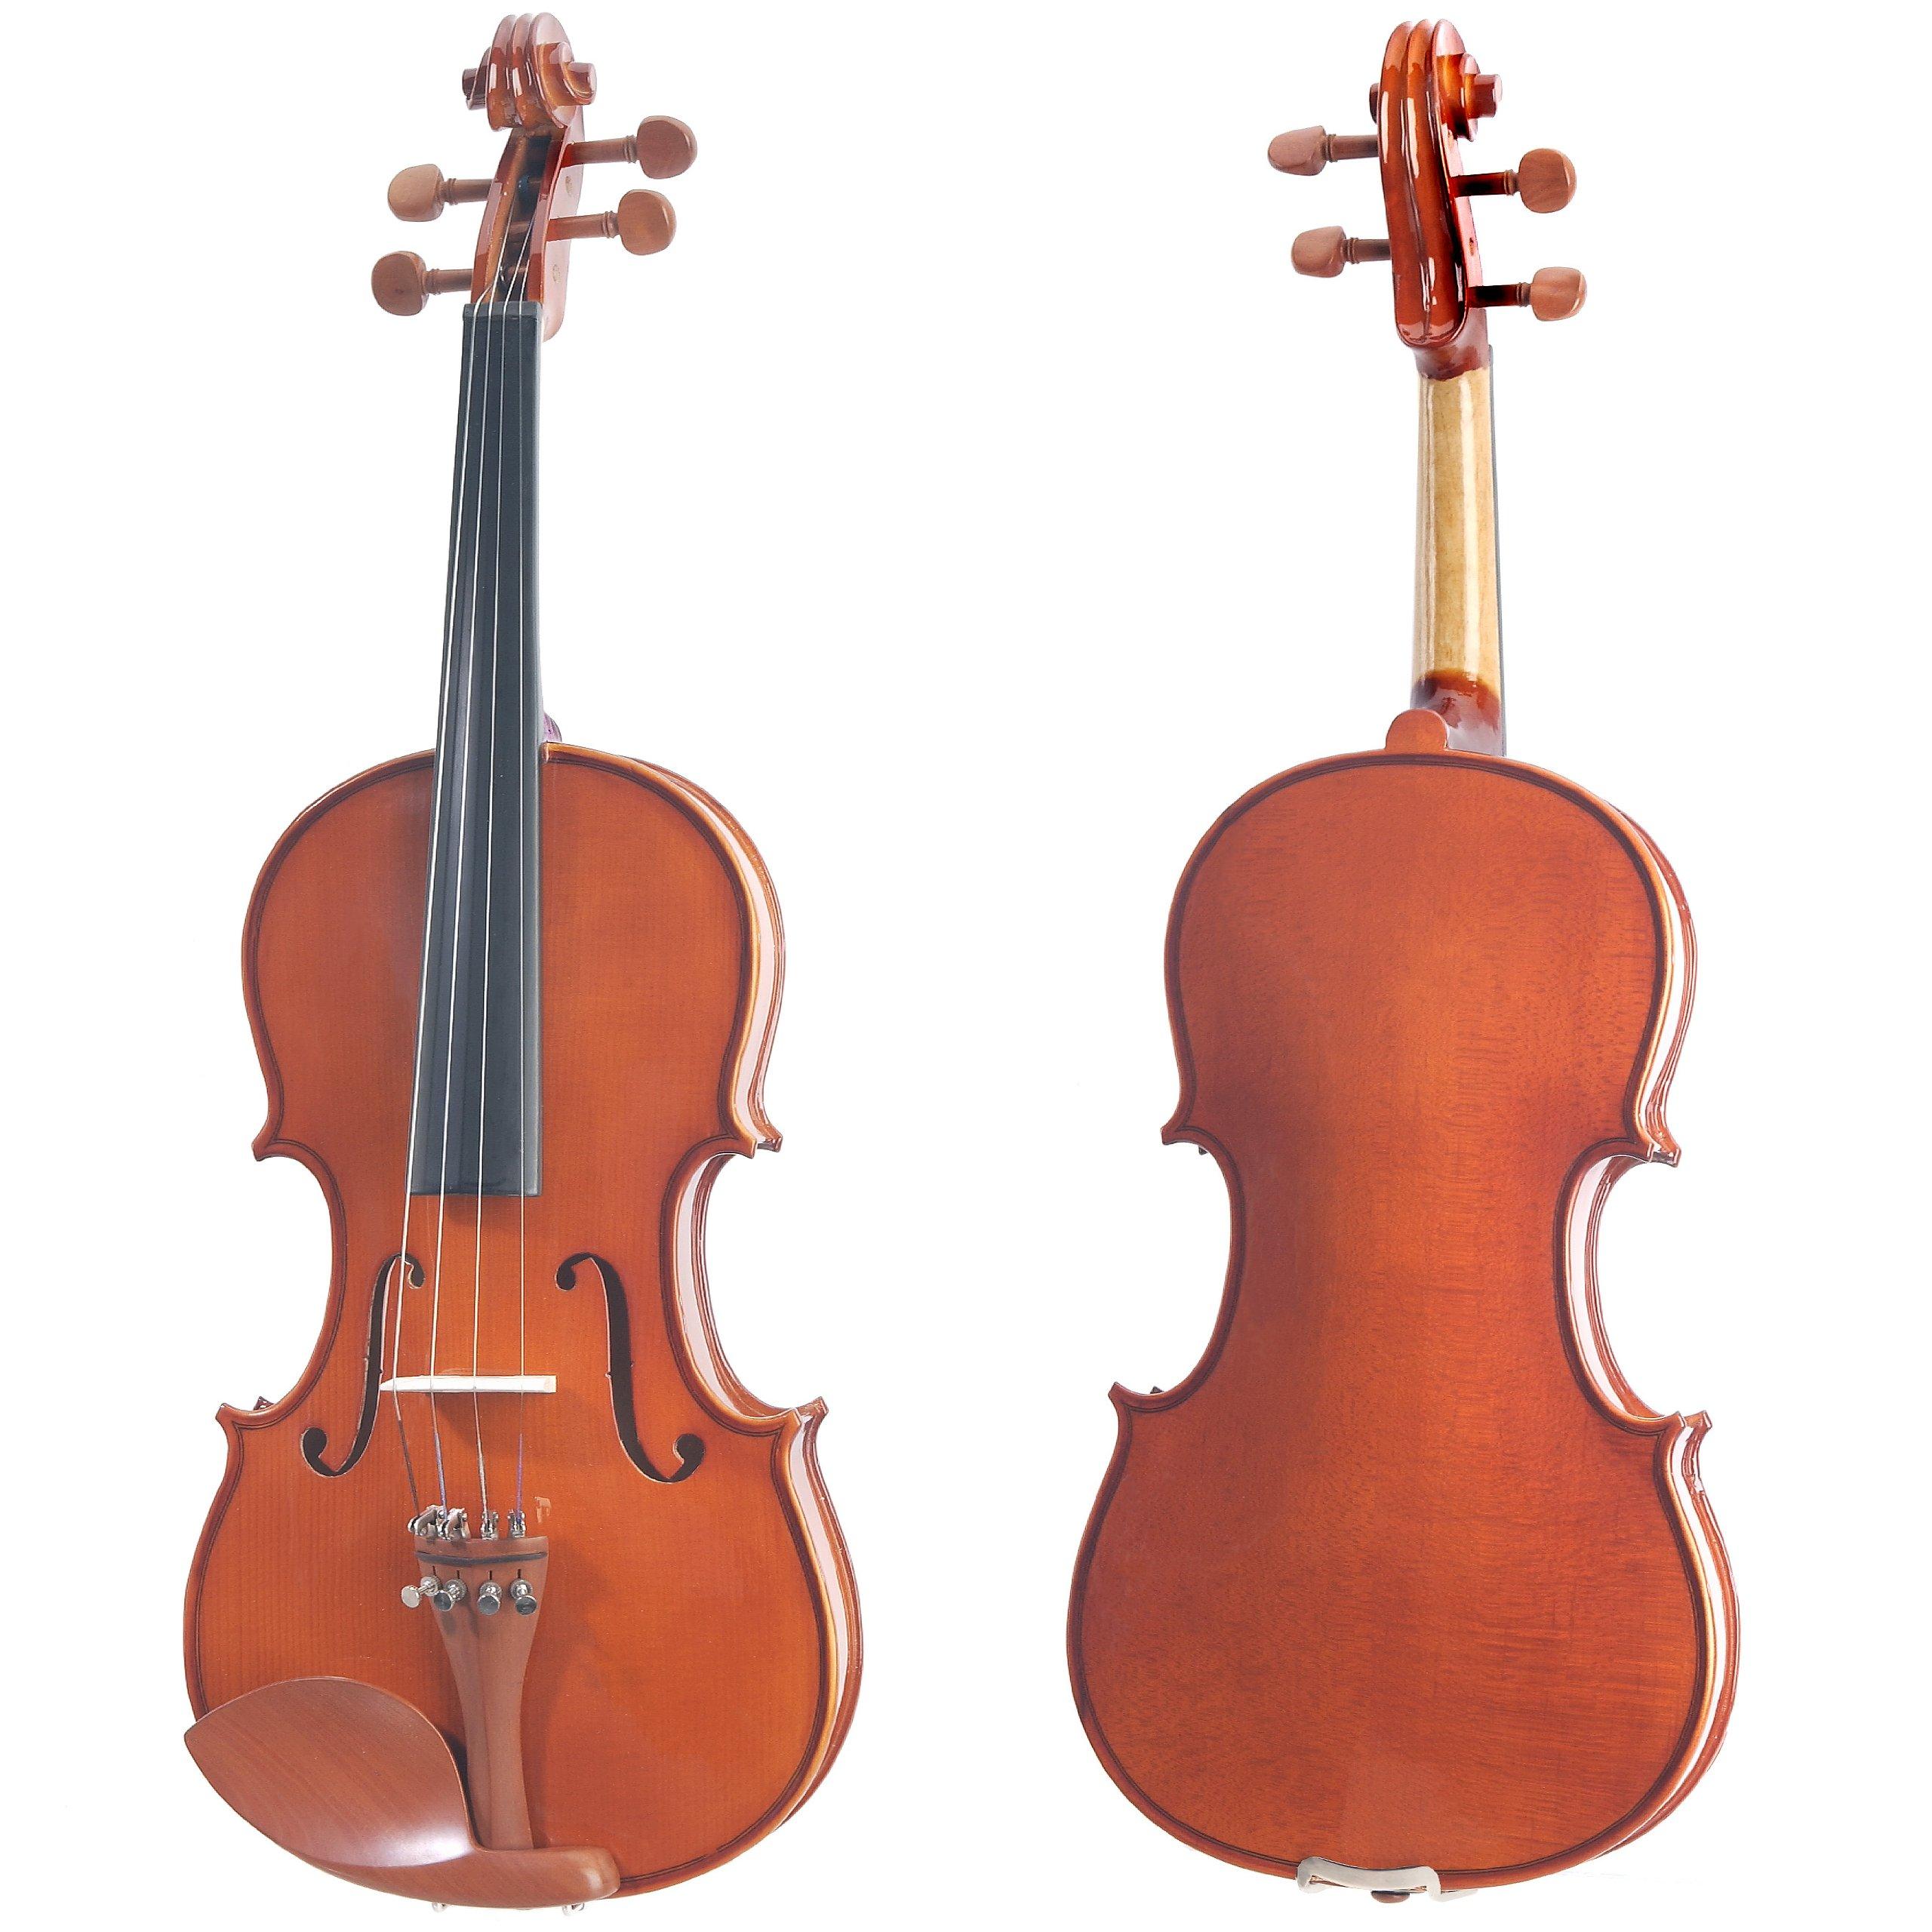 Cecilio CVN-200 Solidwood Violin with D'Addario Prelude Strings, Size 4/4 (Full Size) by Cecilio (Image #2)